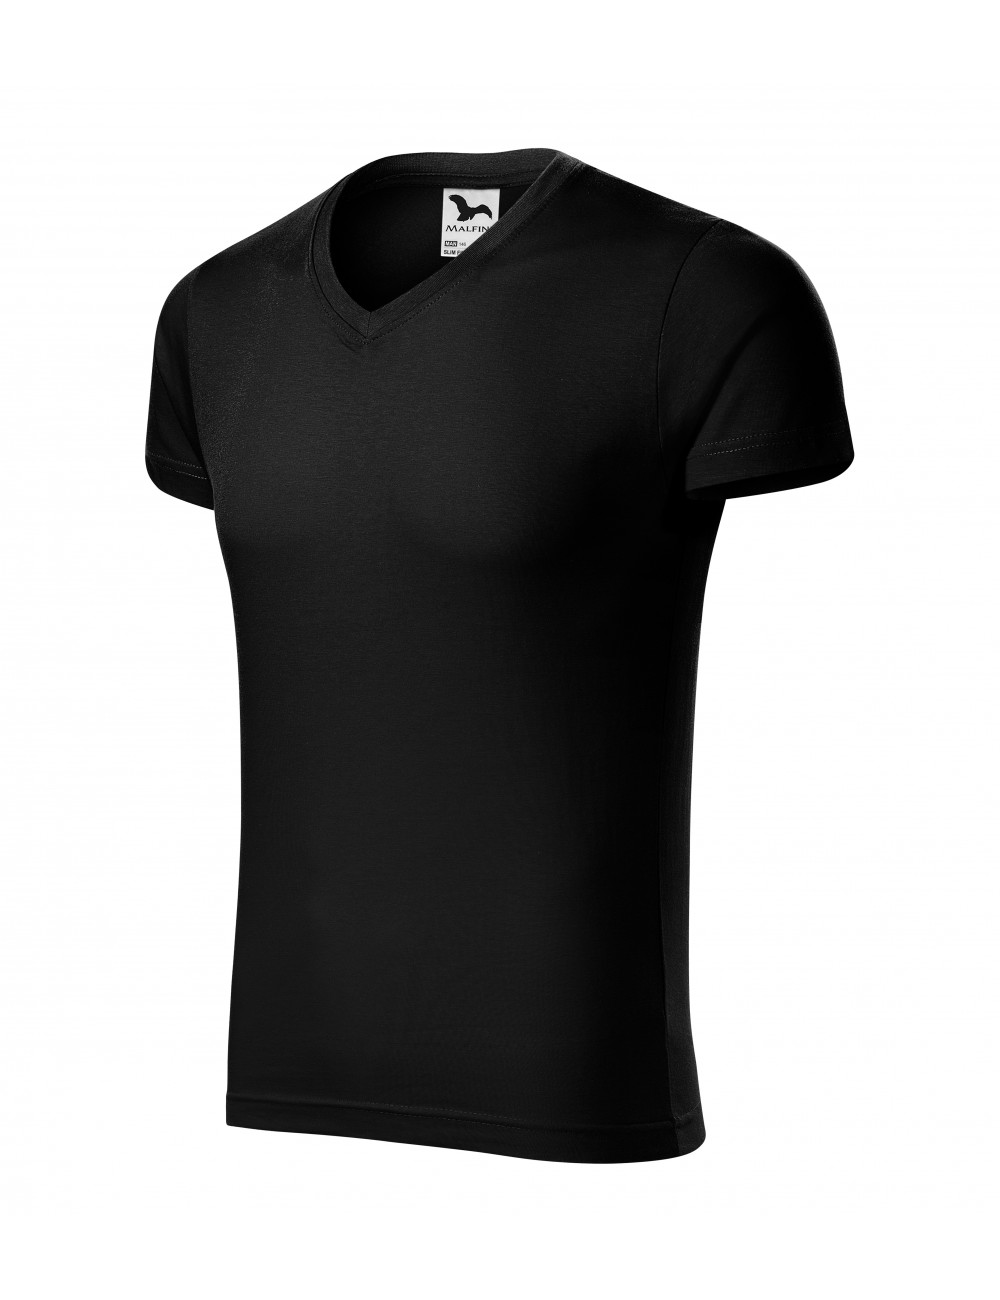 Adler MALFINI Koszulka męska Slim Fit V-neck 146 czarny